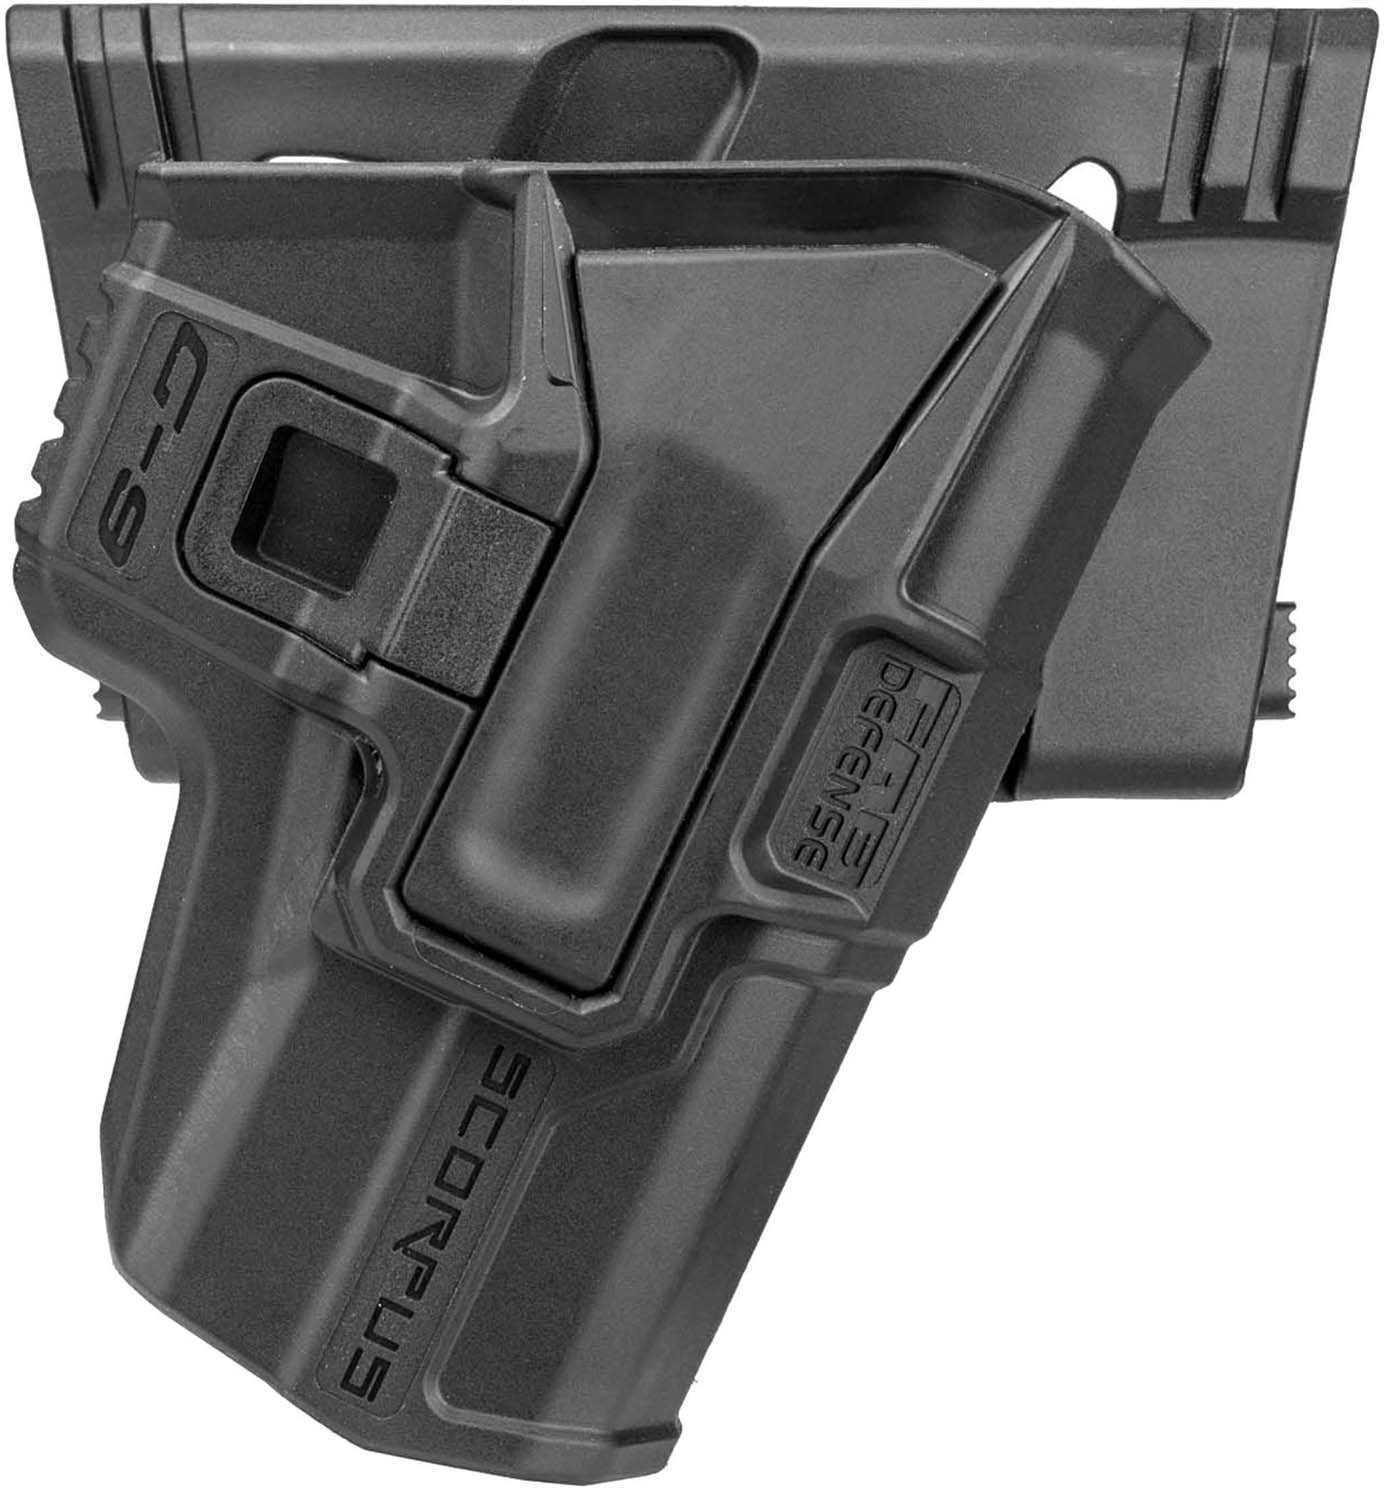 Mako Group Model M24 Belt Holster Smith & Wesson M&P 9/.40, Ambidextrous, Black Md: M24 Belt M&P-B